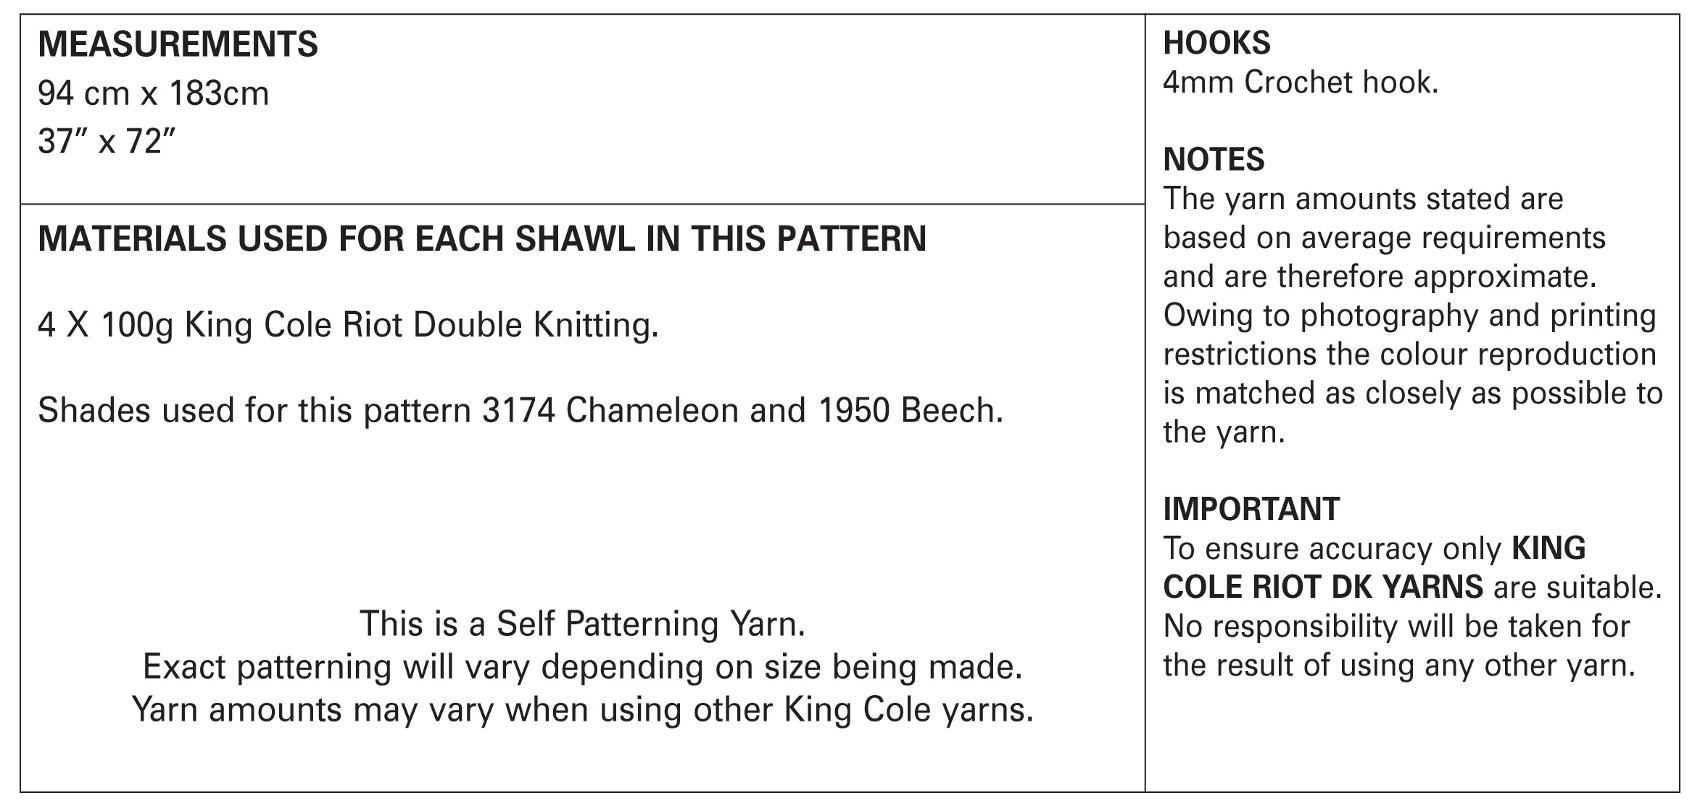 Ladies Virus Shawl Double Knit Crochet Pattern Womens King Cole Riot